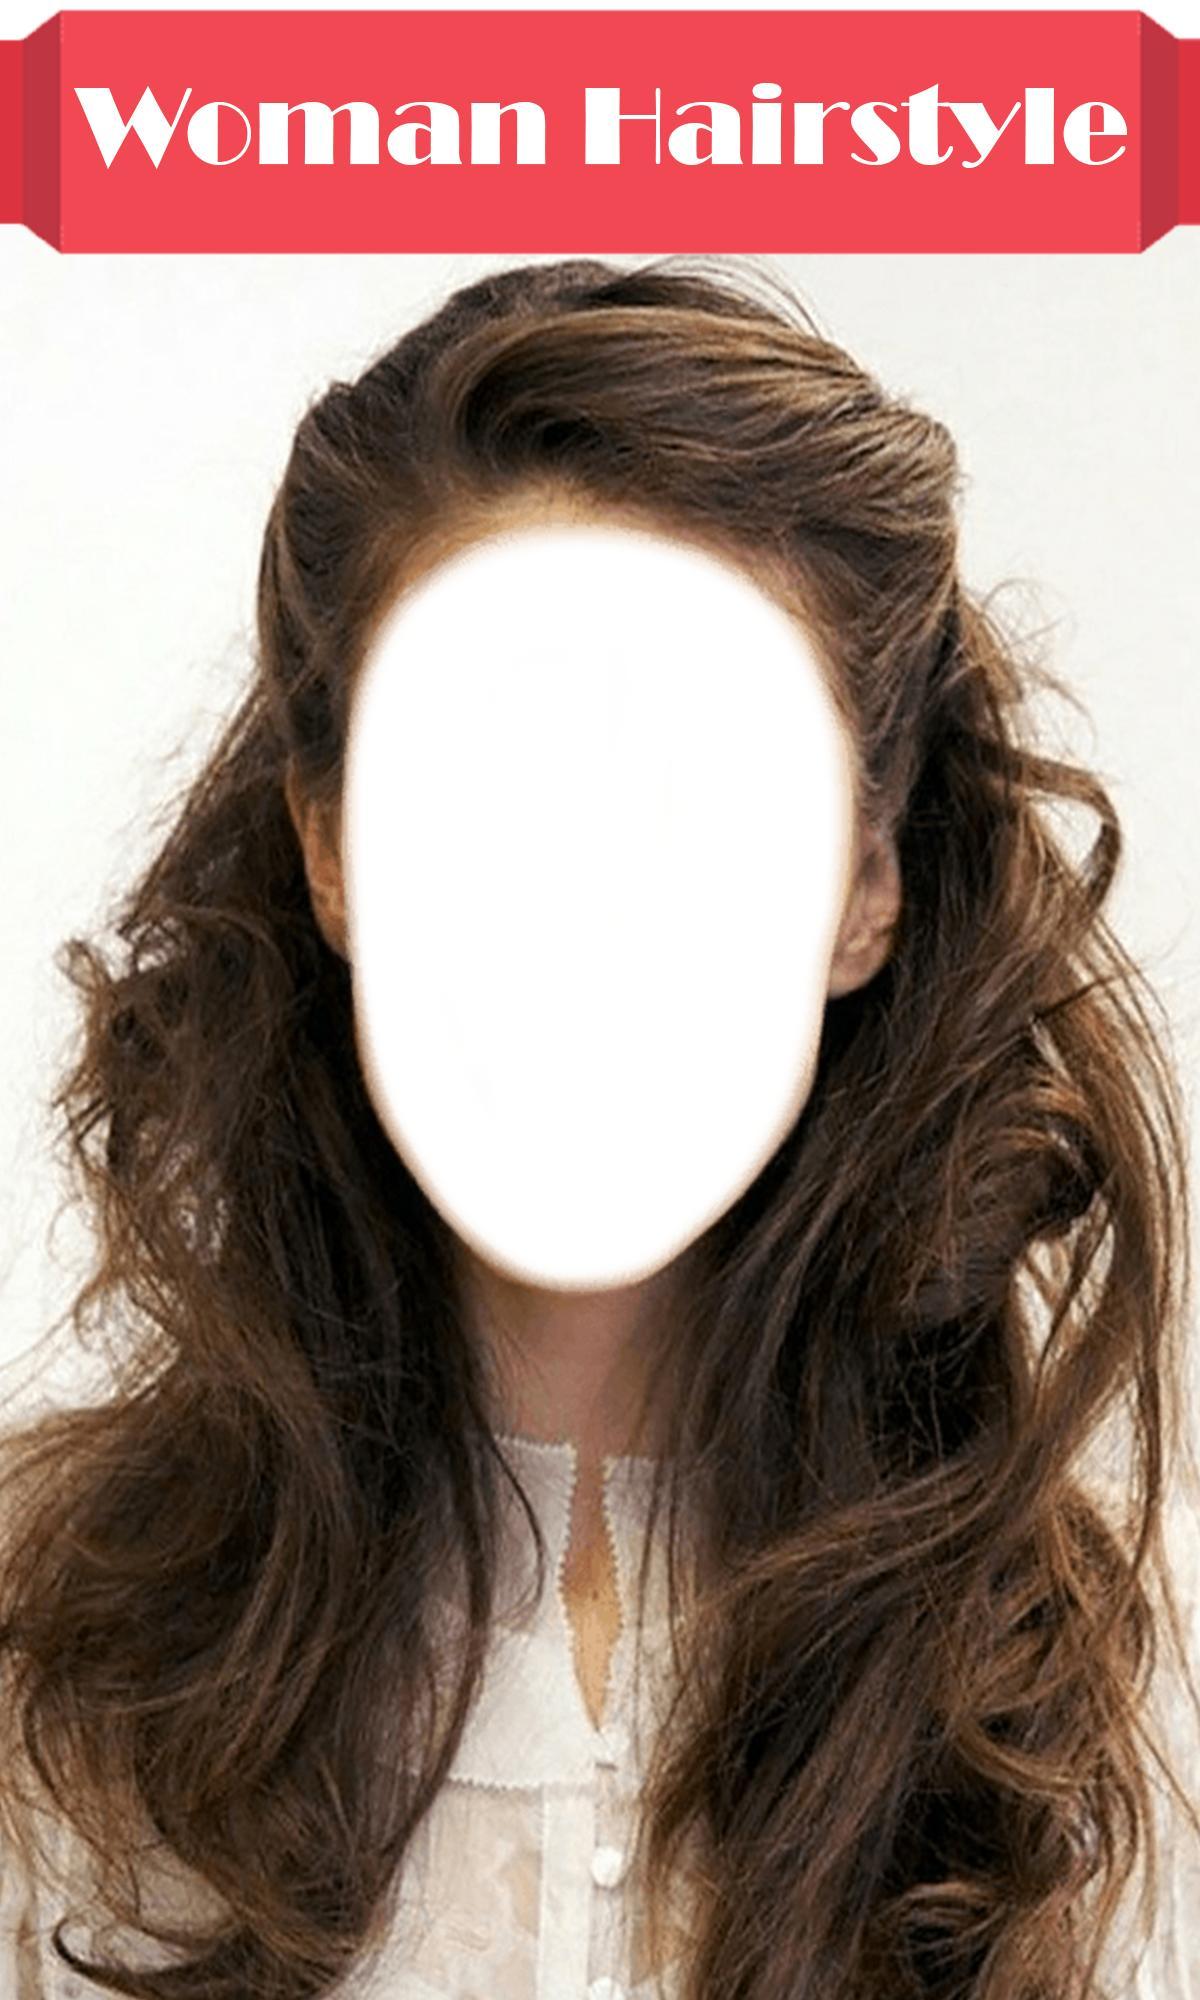 Hair style women 2020